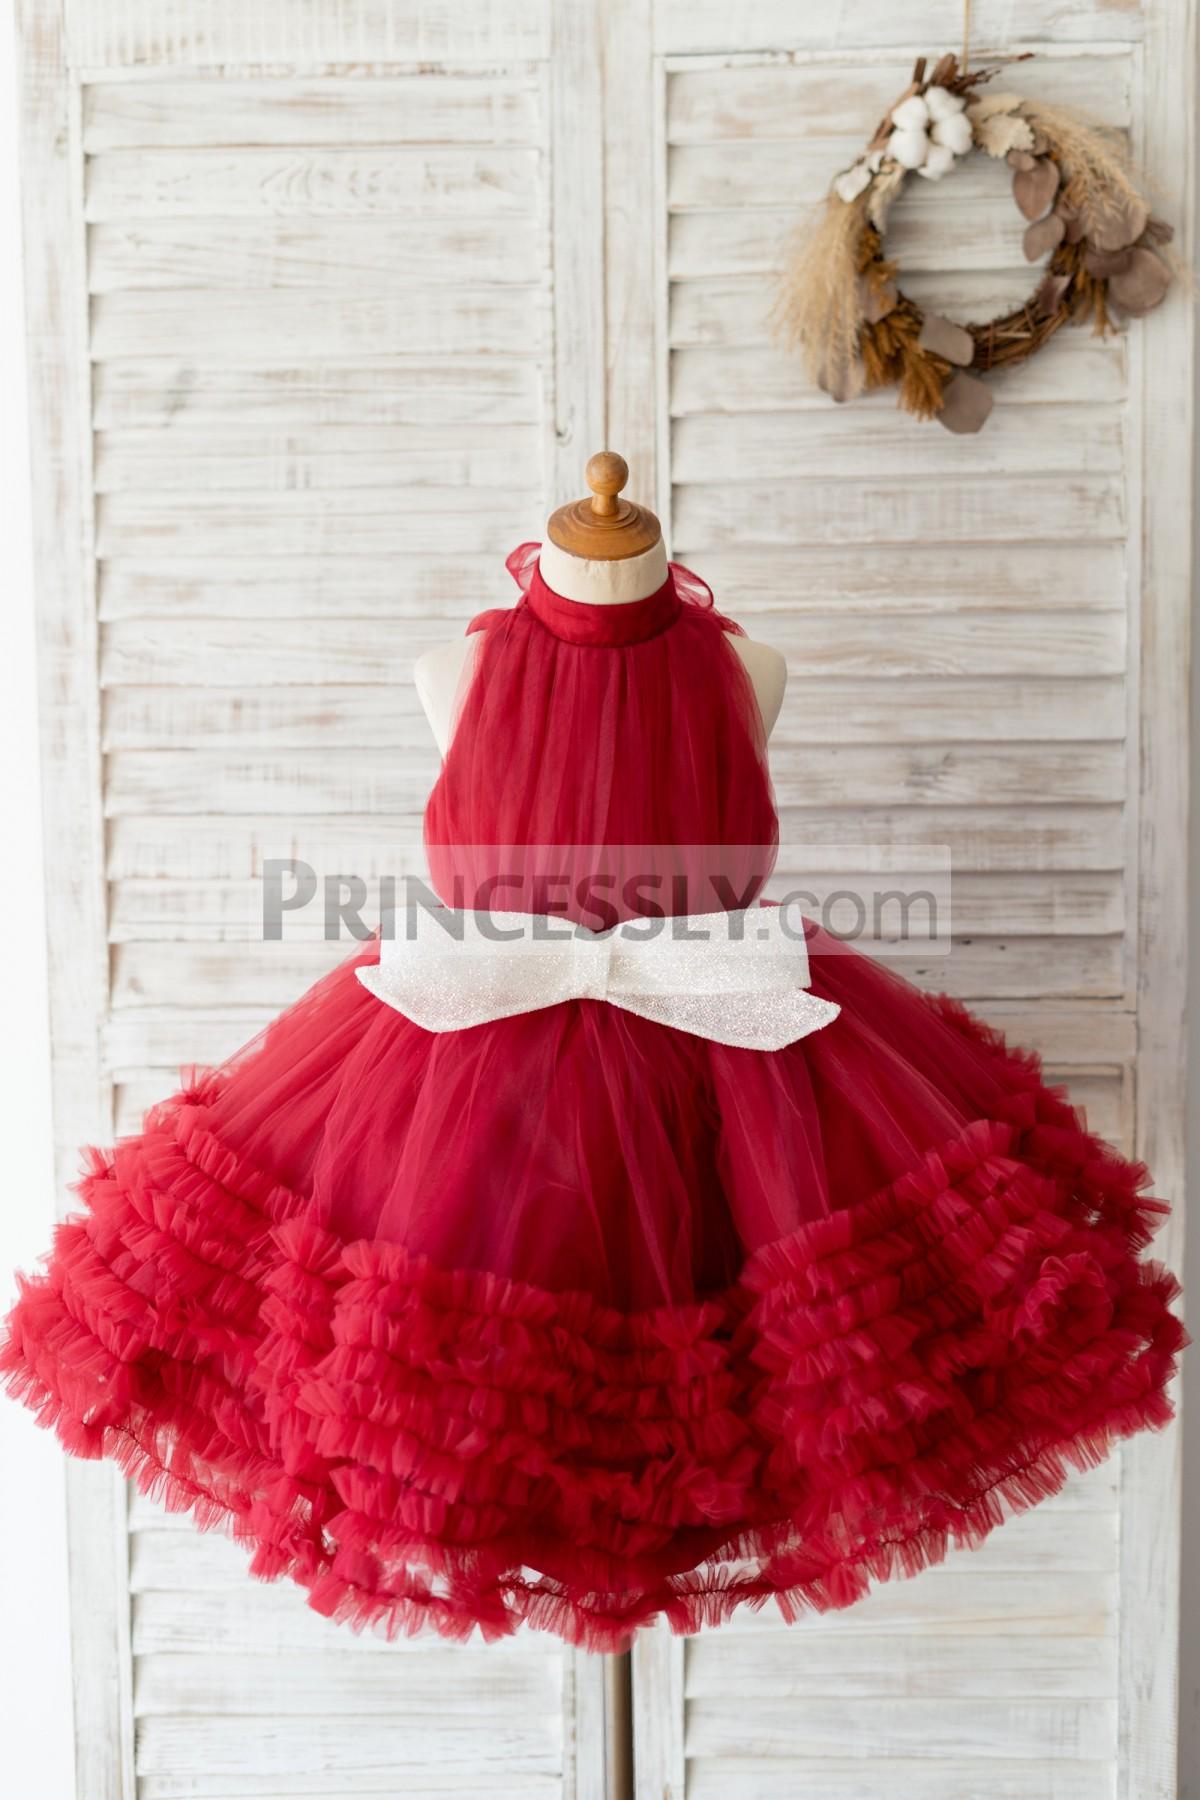 Princessly.com-K1004130-Halter Neck Burgundy Tulle Ruffles Wedding Flower Girl Dress Kids Party Dress-31